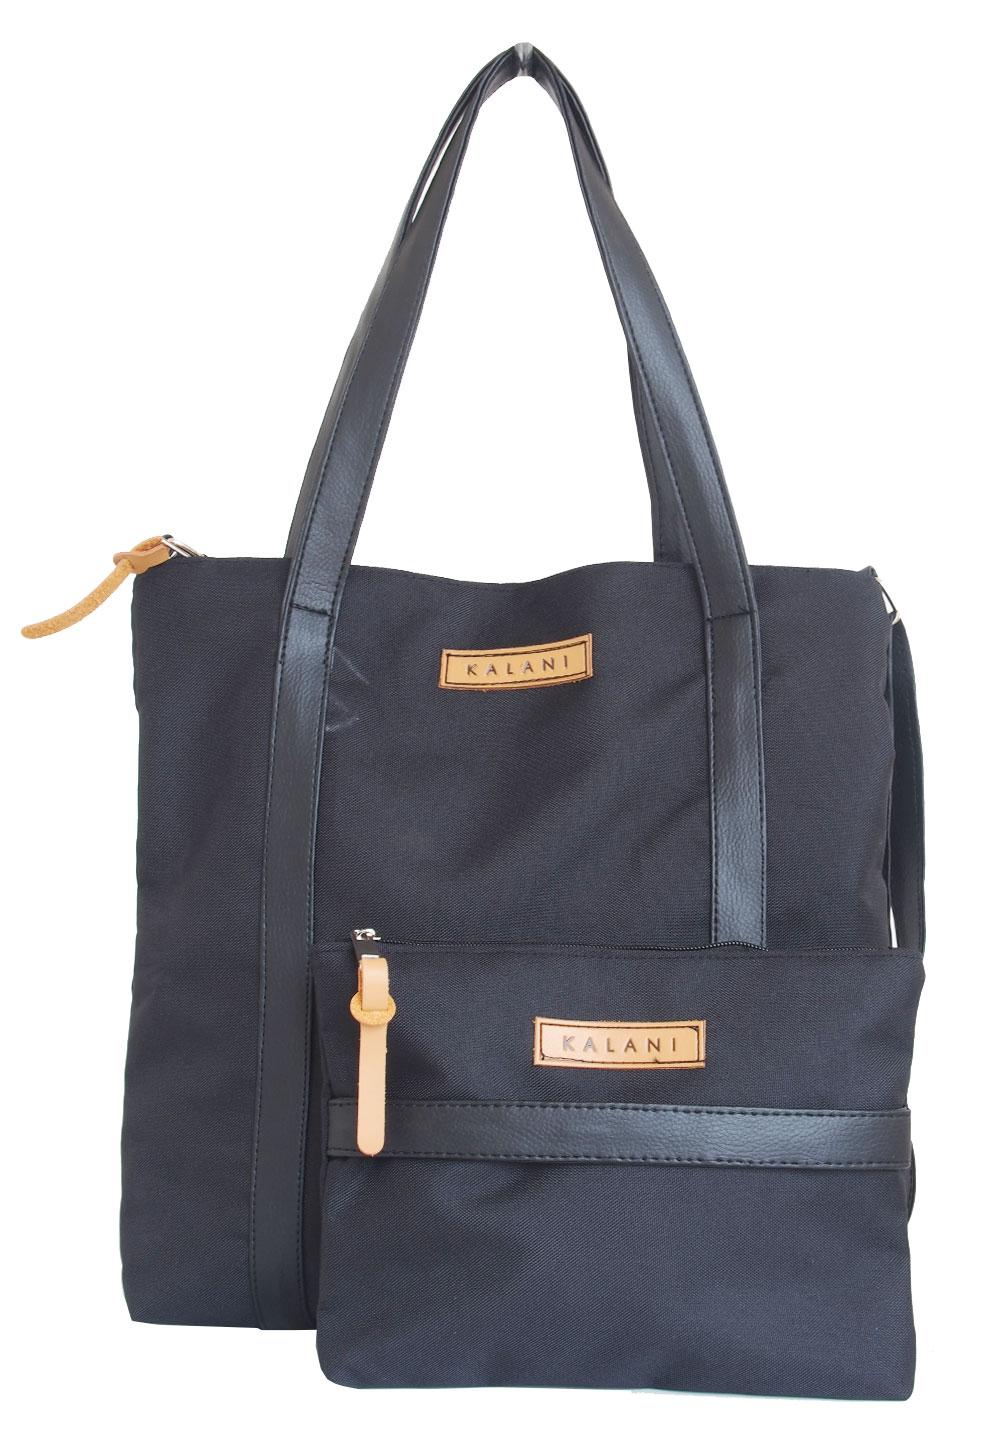 Hasil gambar untuk Kalani Bags